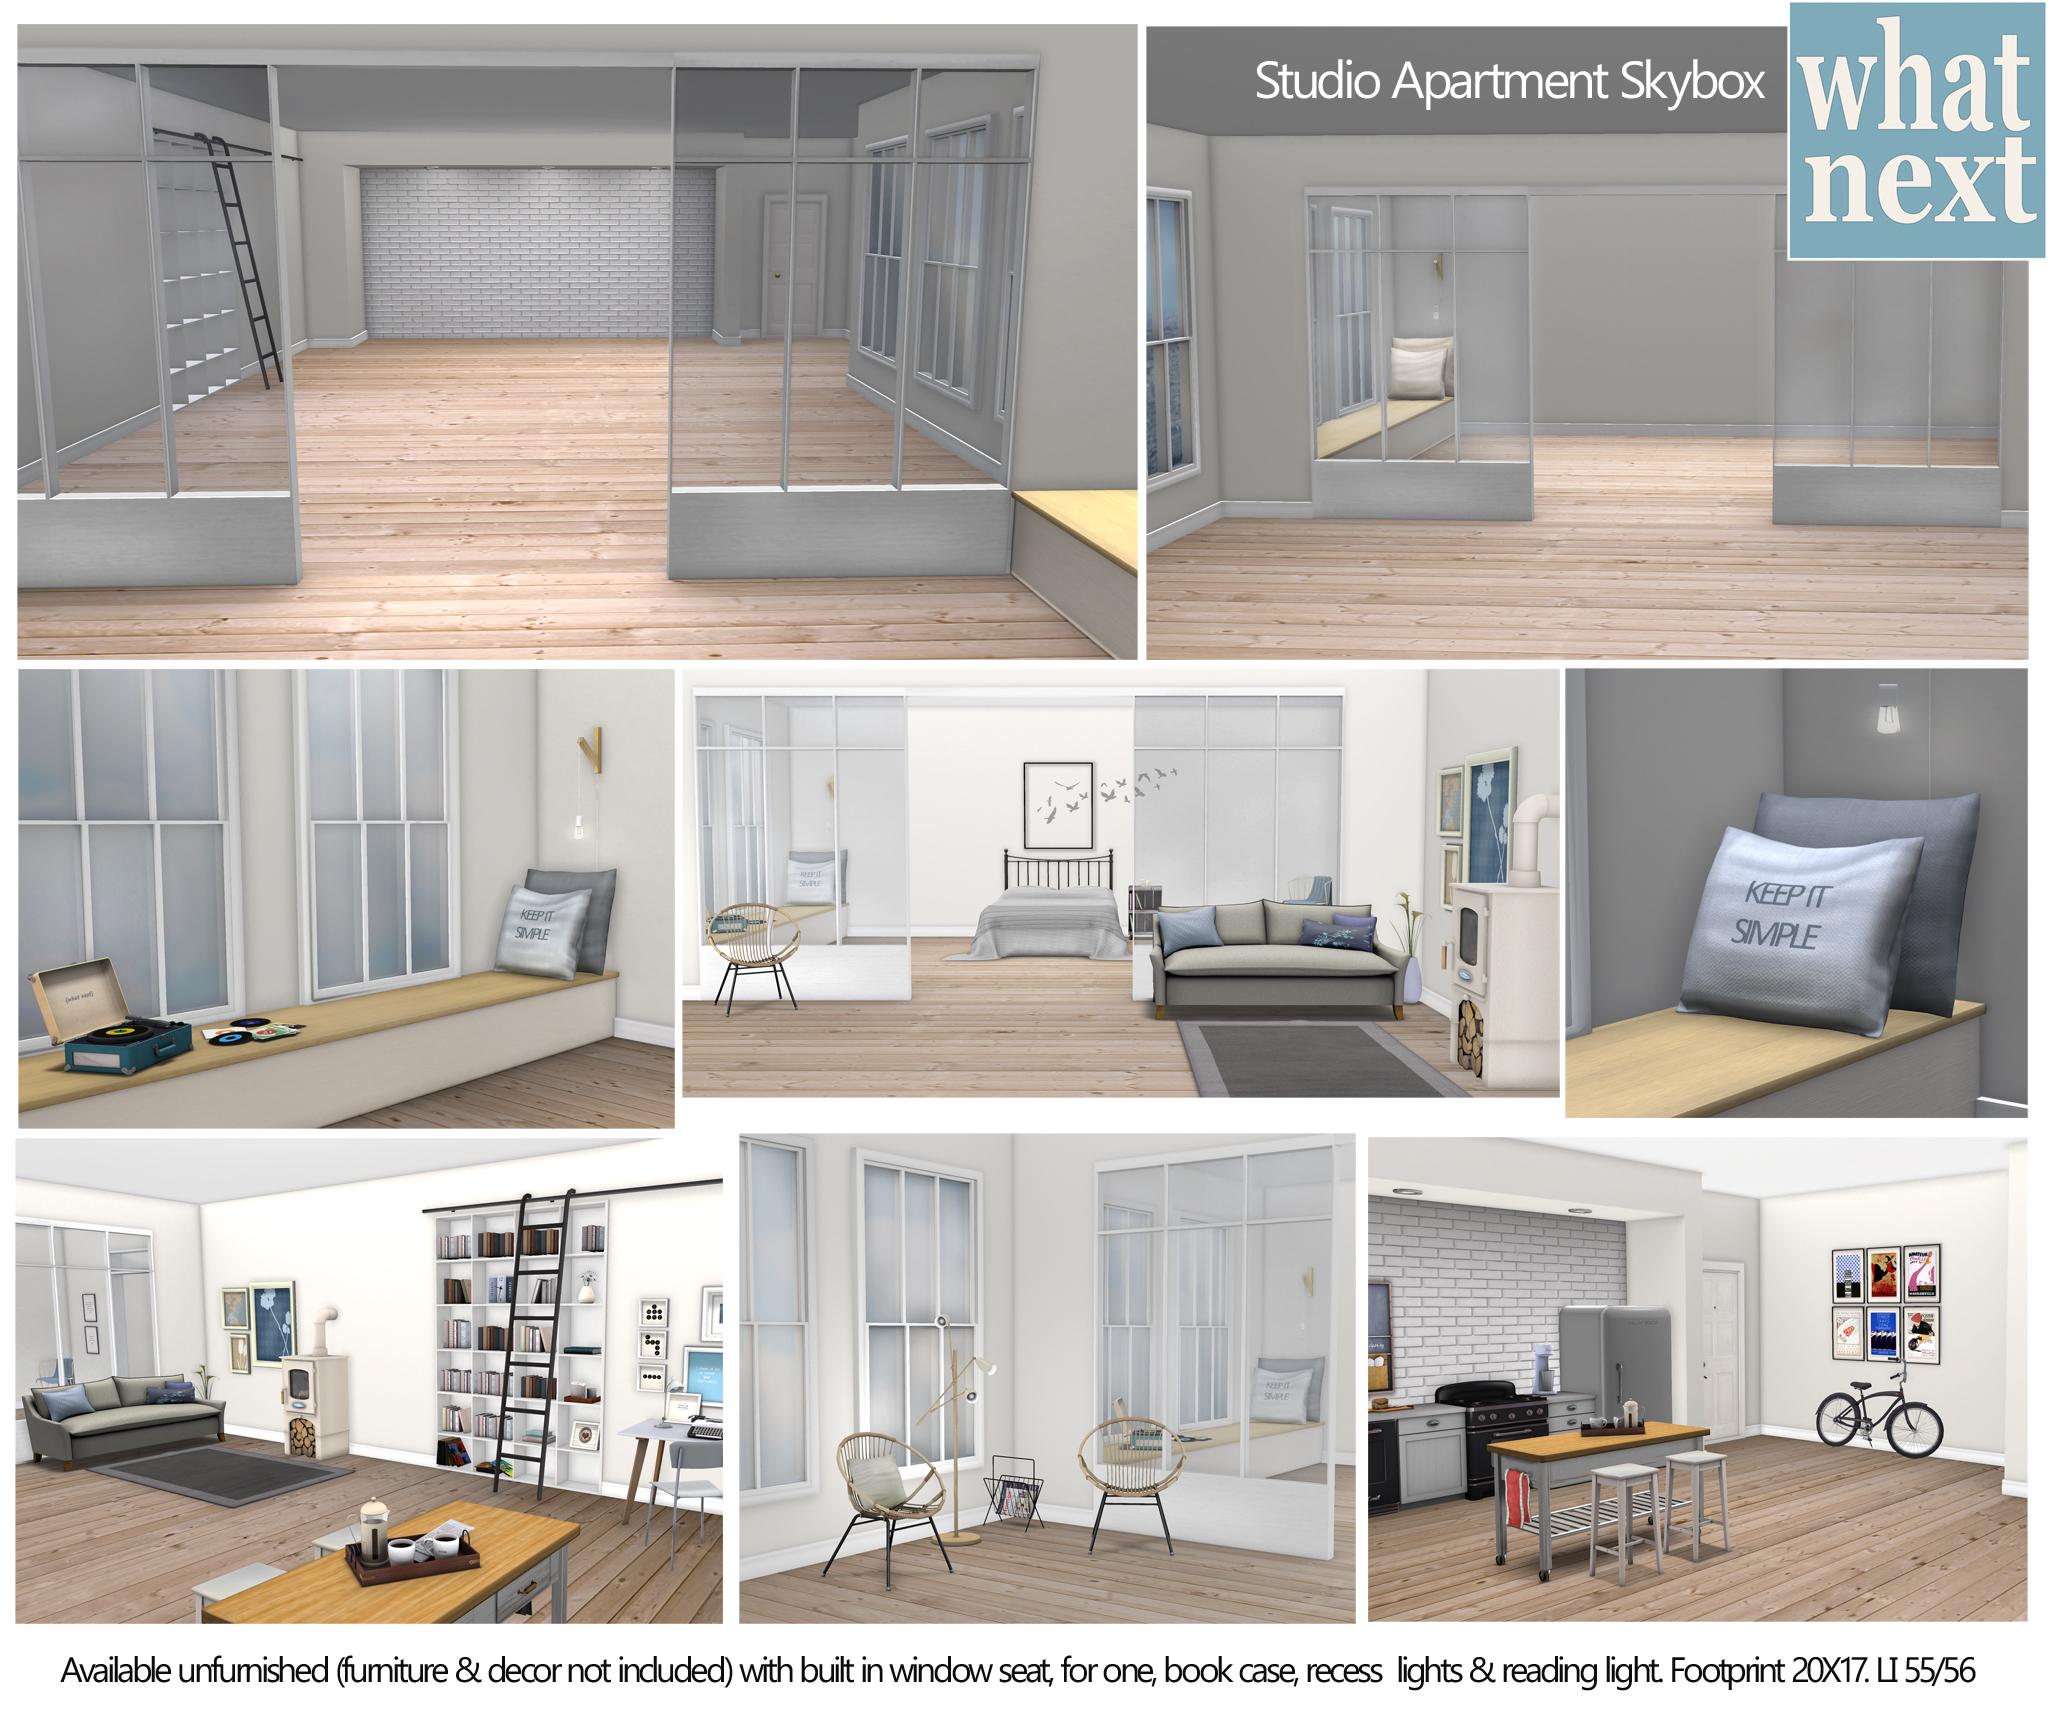 Virtual Home Design Studio: Studio Apartment Skybox